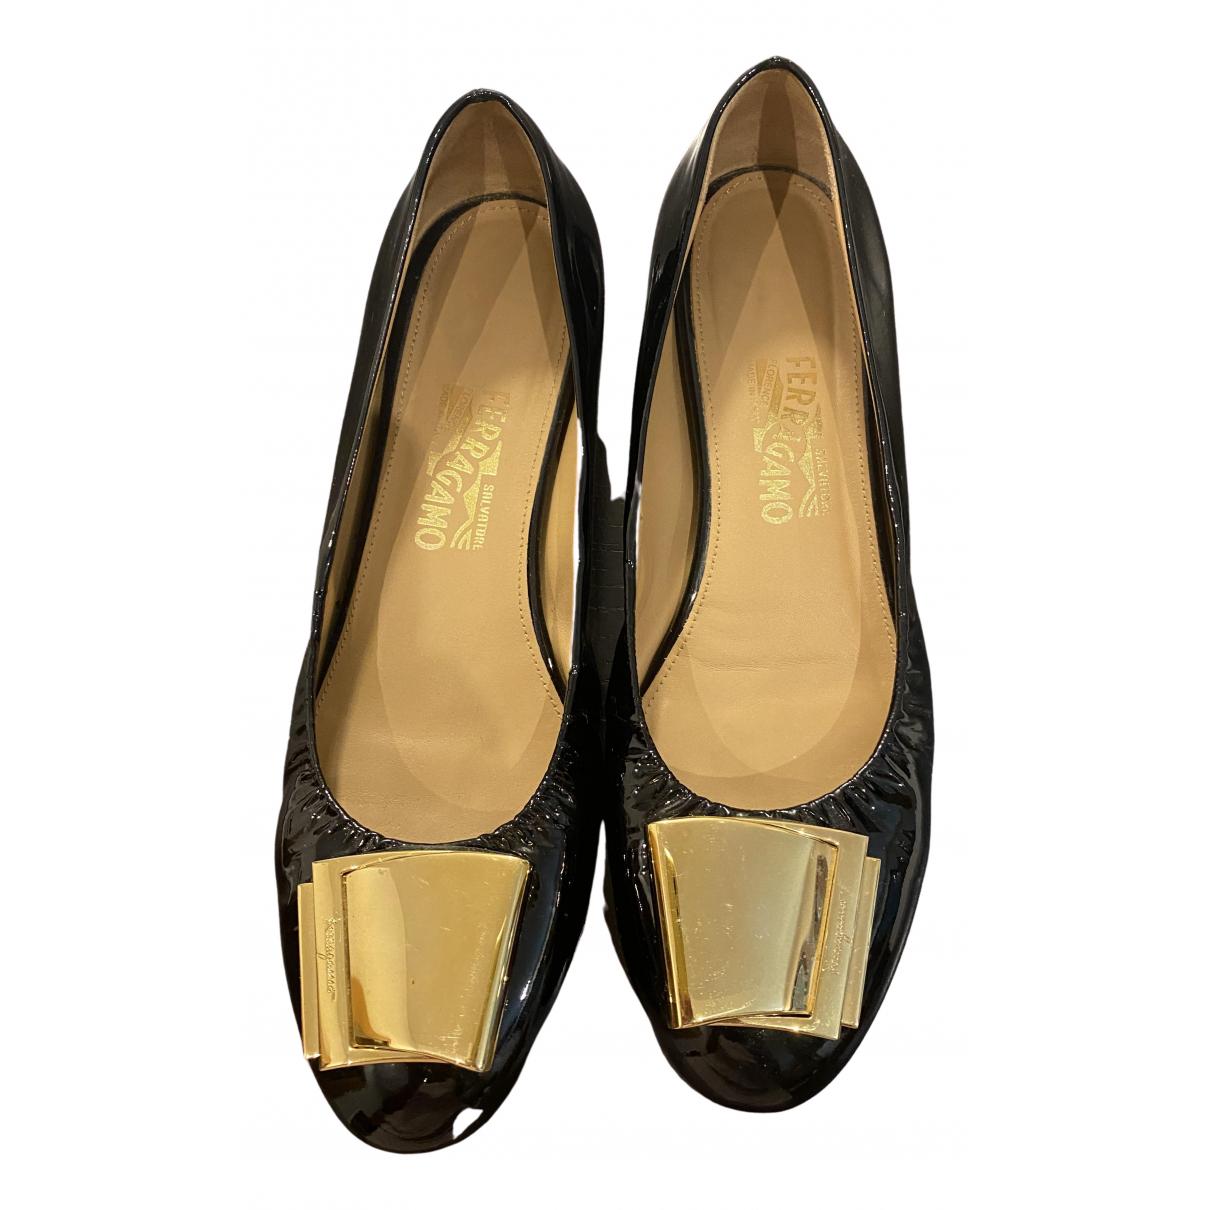 Salvatore Ferragamo \N Black Patent leather Ballet flats for Women 9 US